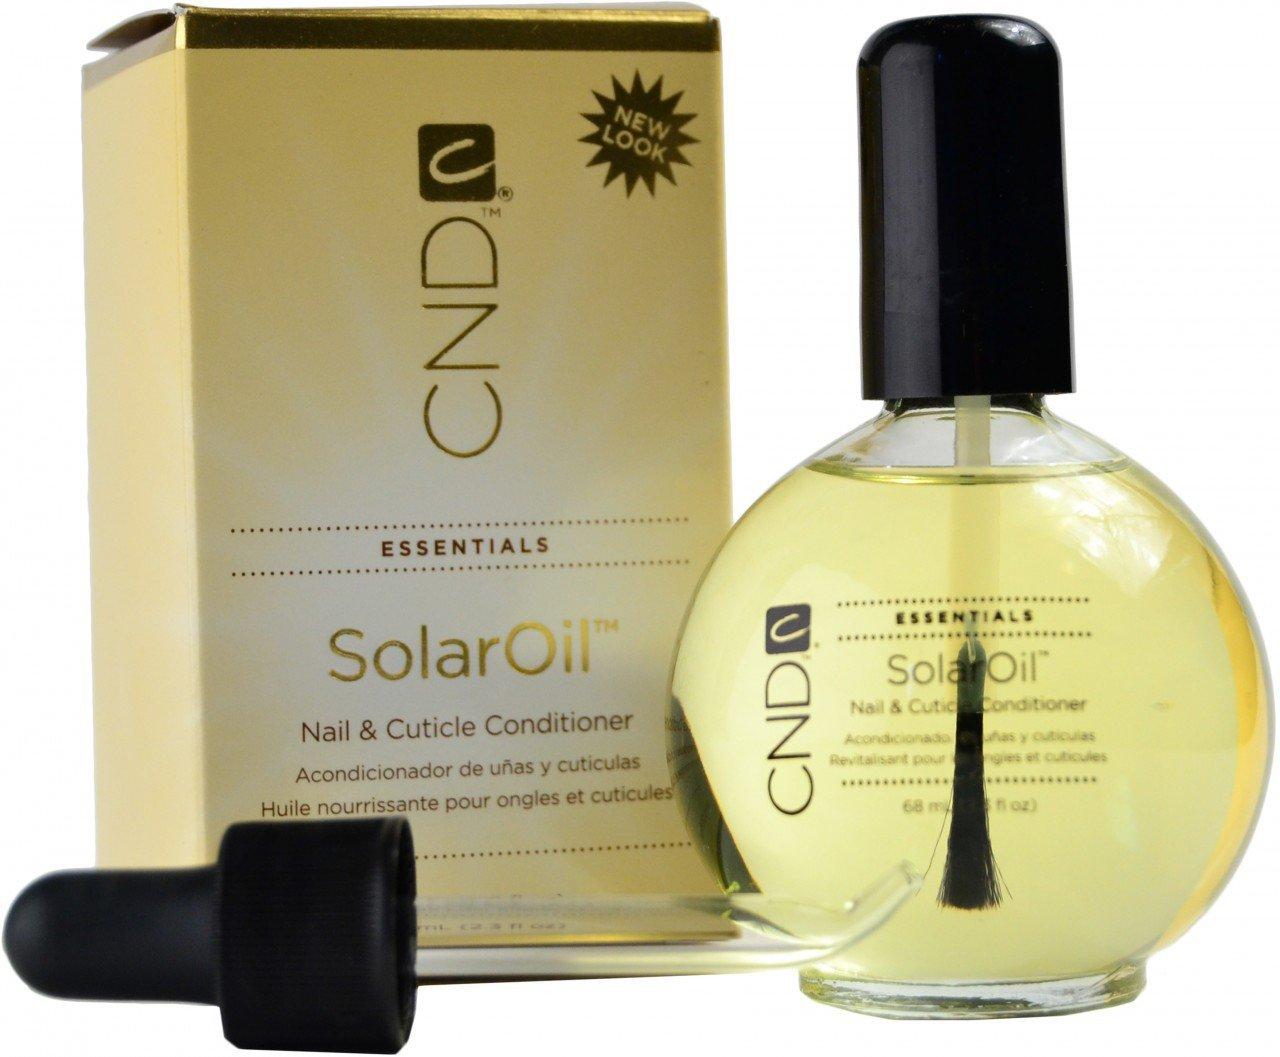 Cnd shellac nail polish 68 ml solar oil amazon beauty prinsesfo Gallery